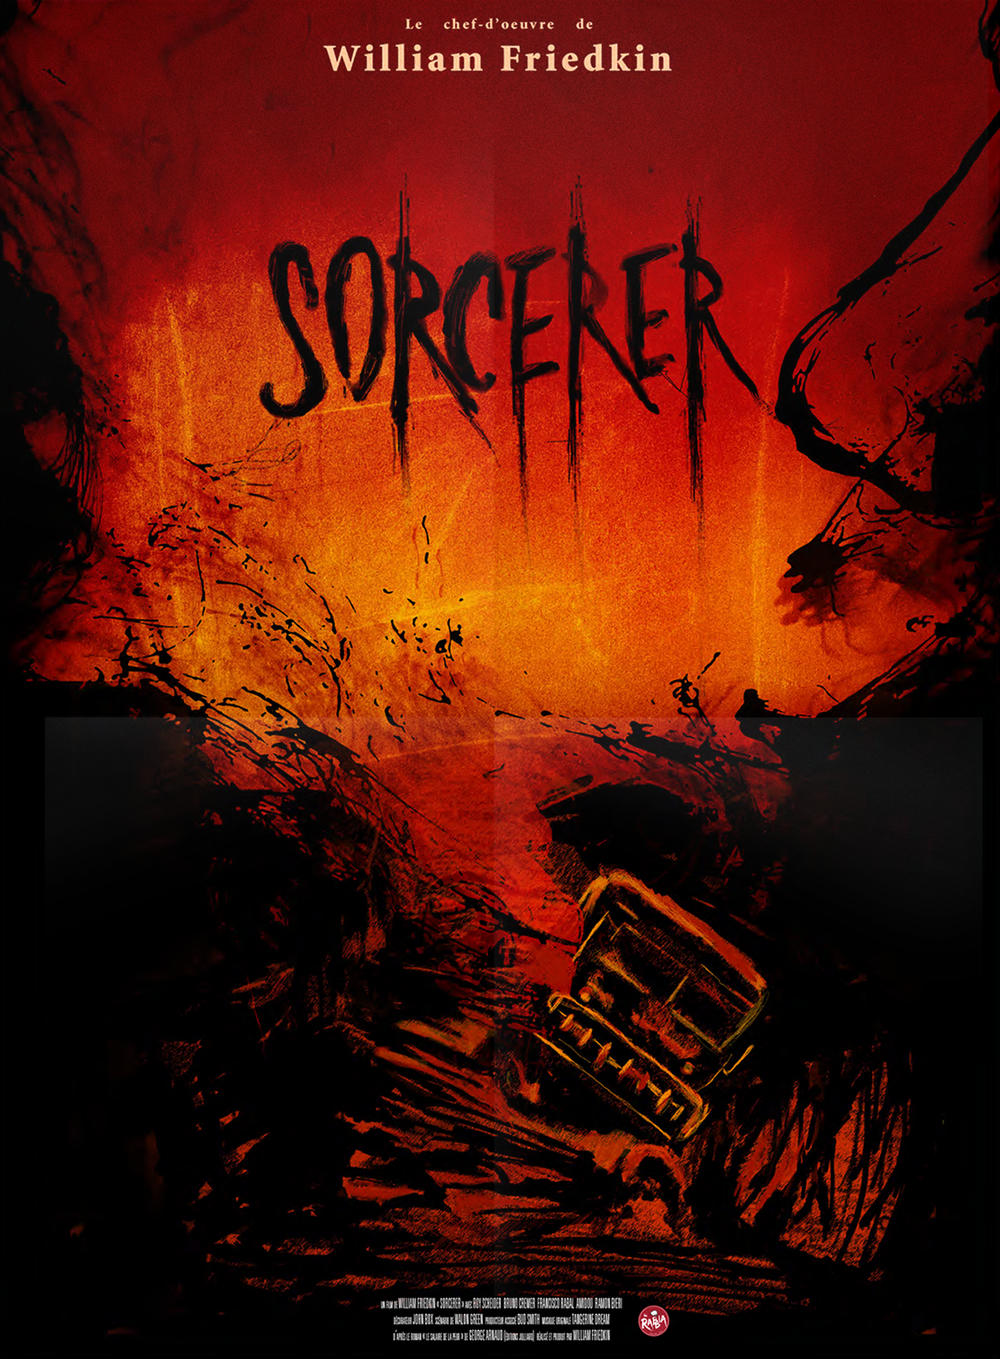 silentnoise - Sorcerer